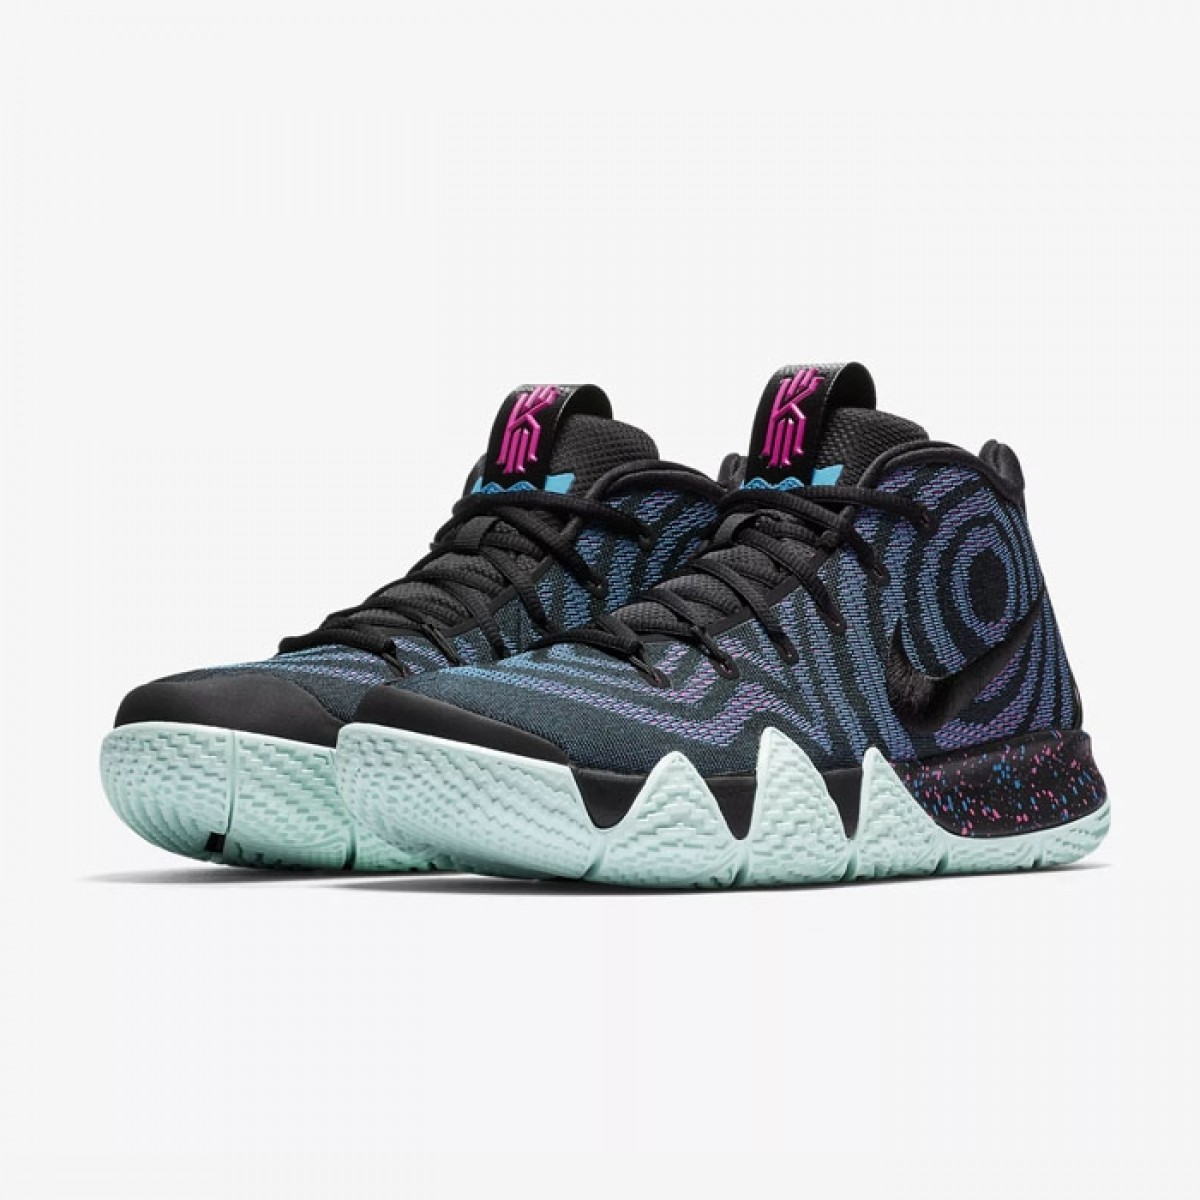 Nike Kyrie 4 '80s' 943806-007